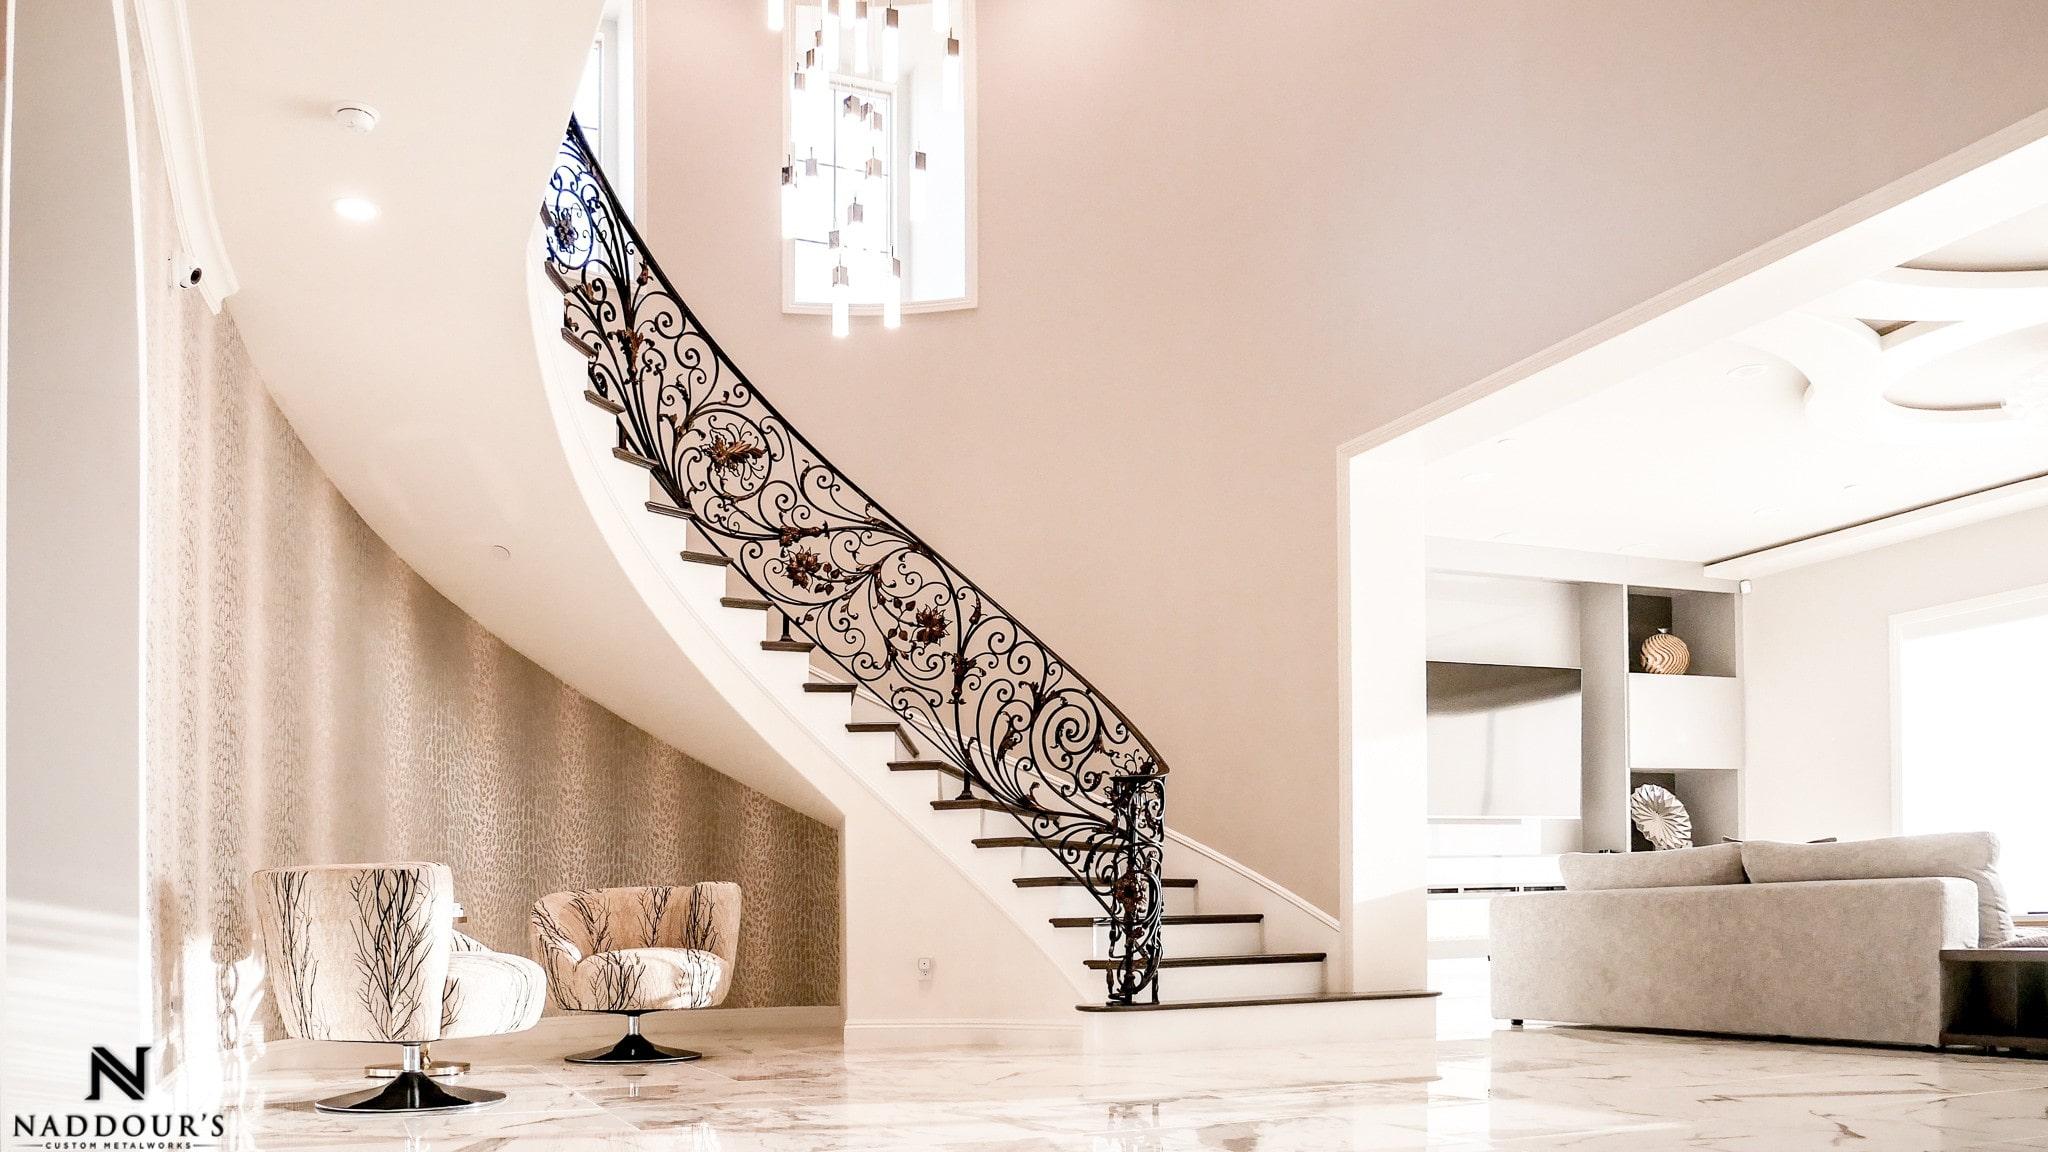 Naddour's Custom Metalworks Custom Staircase Railing Featured Project in Portola Hilla California .jpg 8.jpg